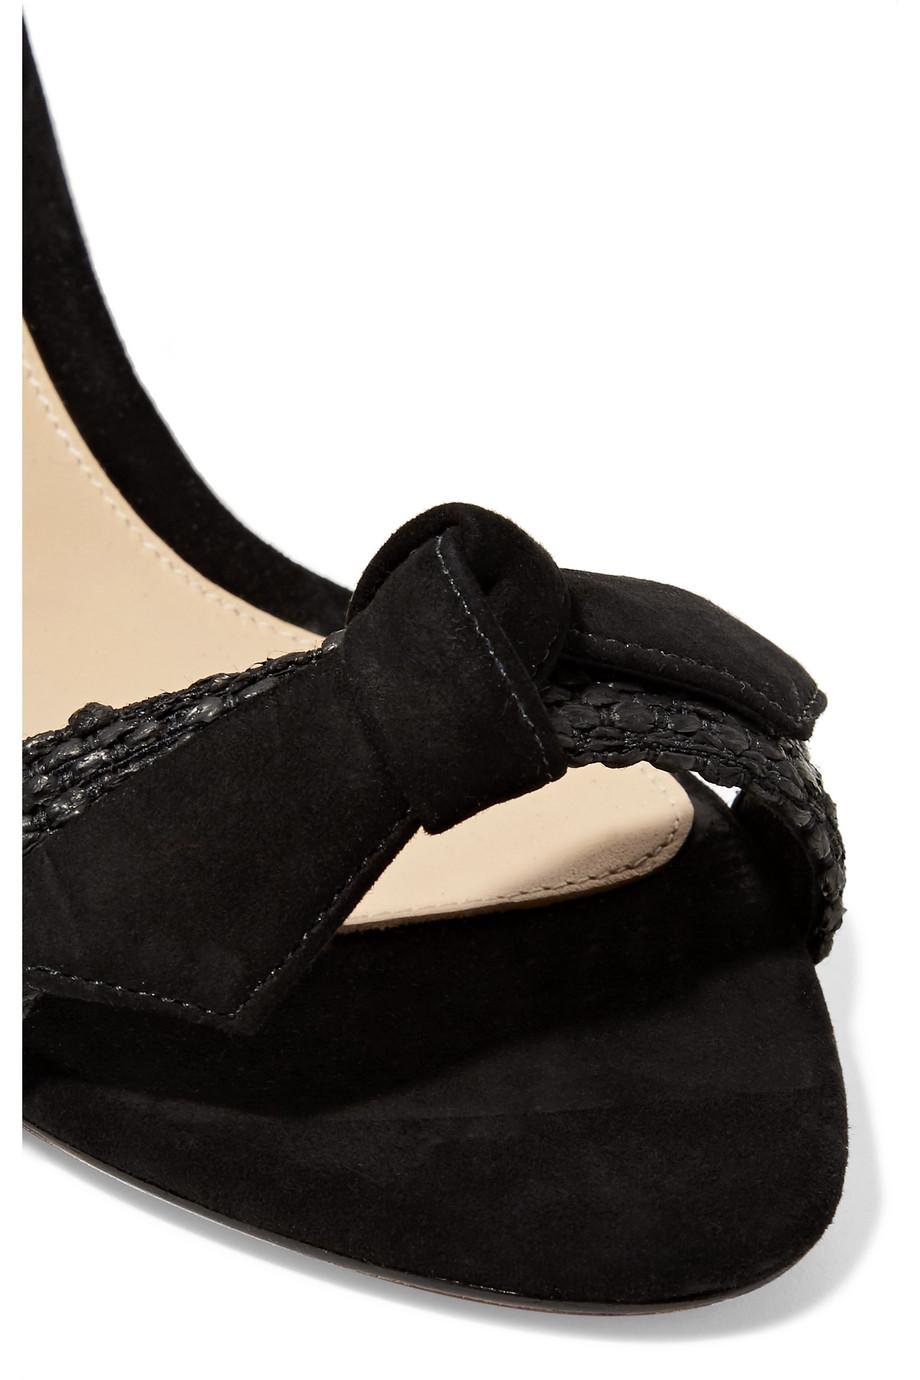 Clarita Bow-embellished Suede And Raffia Espadrille Wedge Sandals - Black Alexandre Birman np5BMhdM